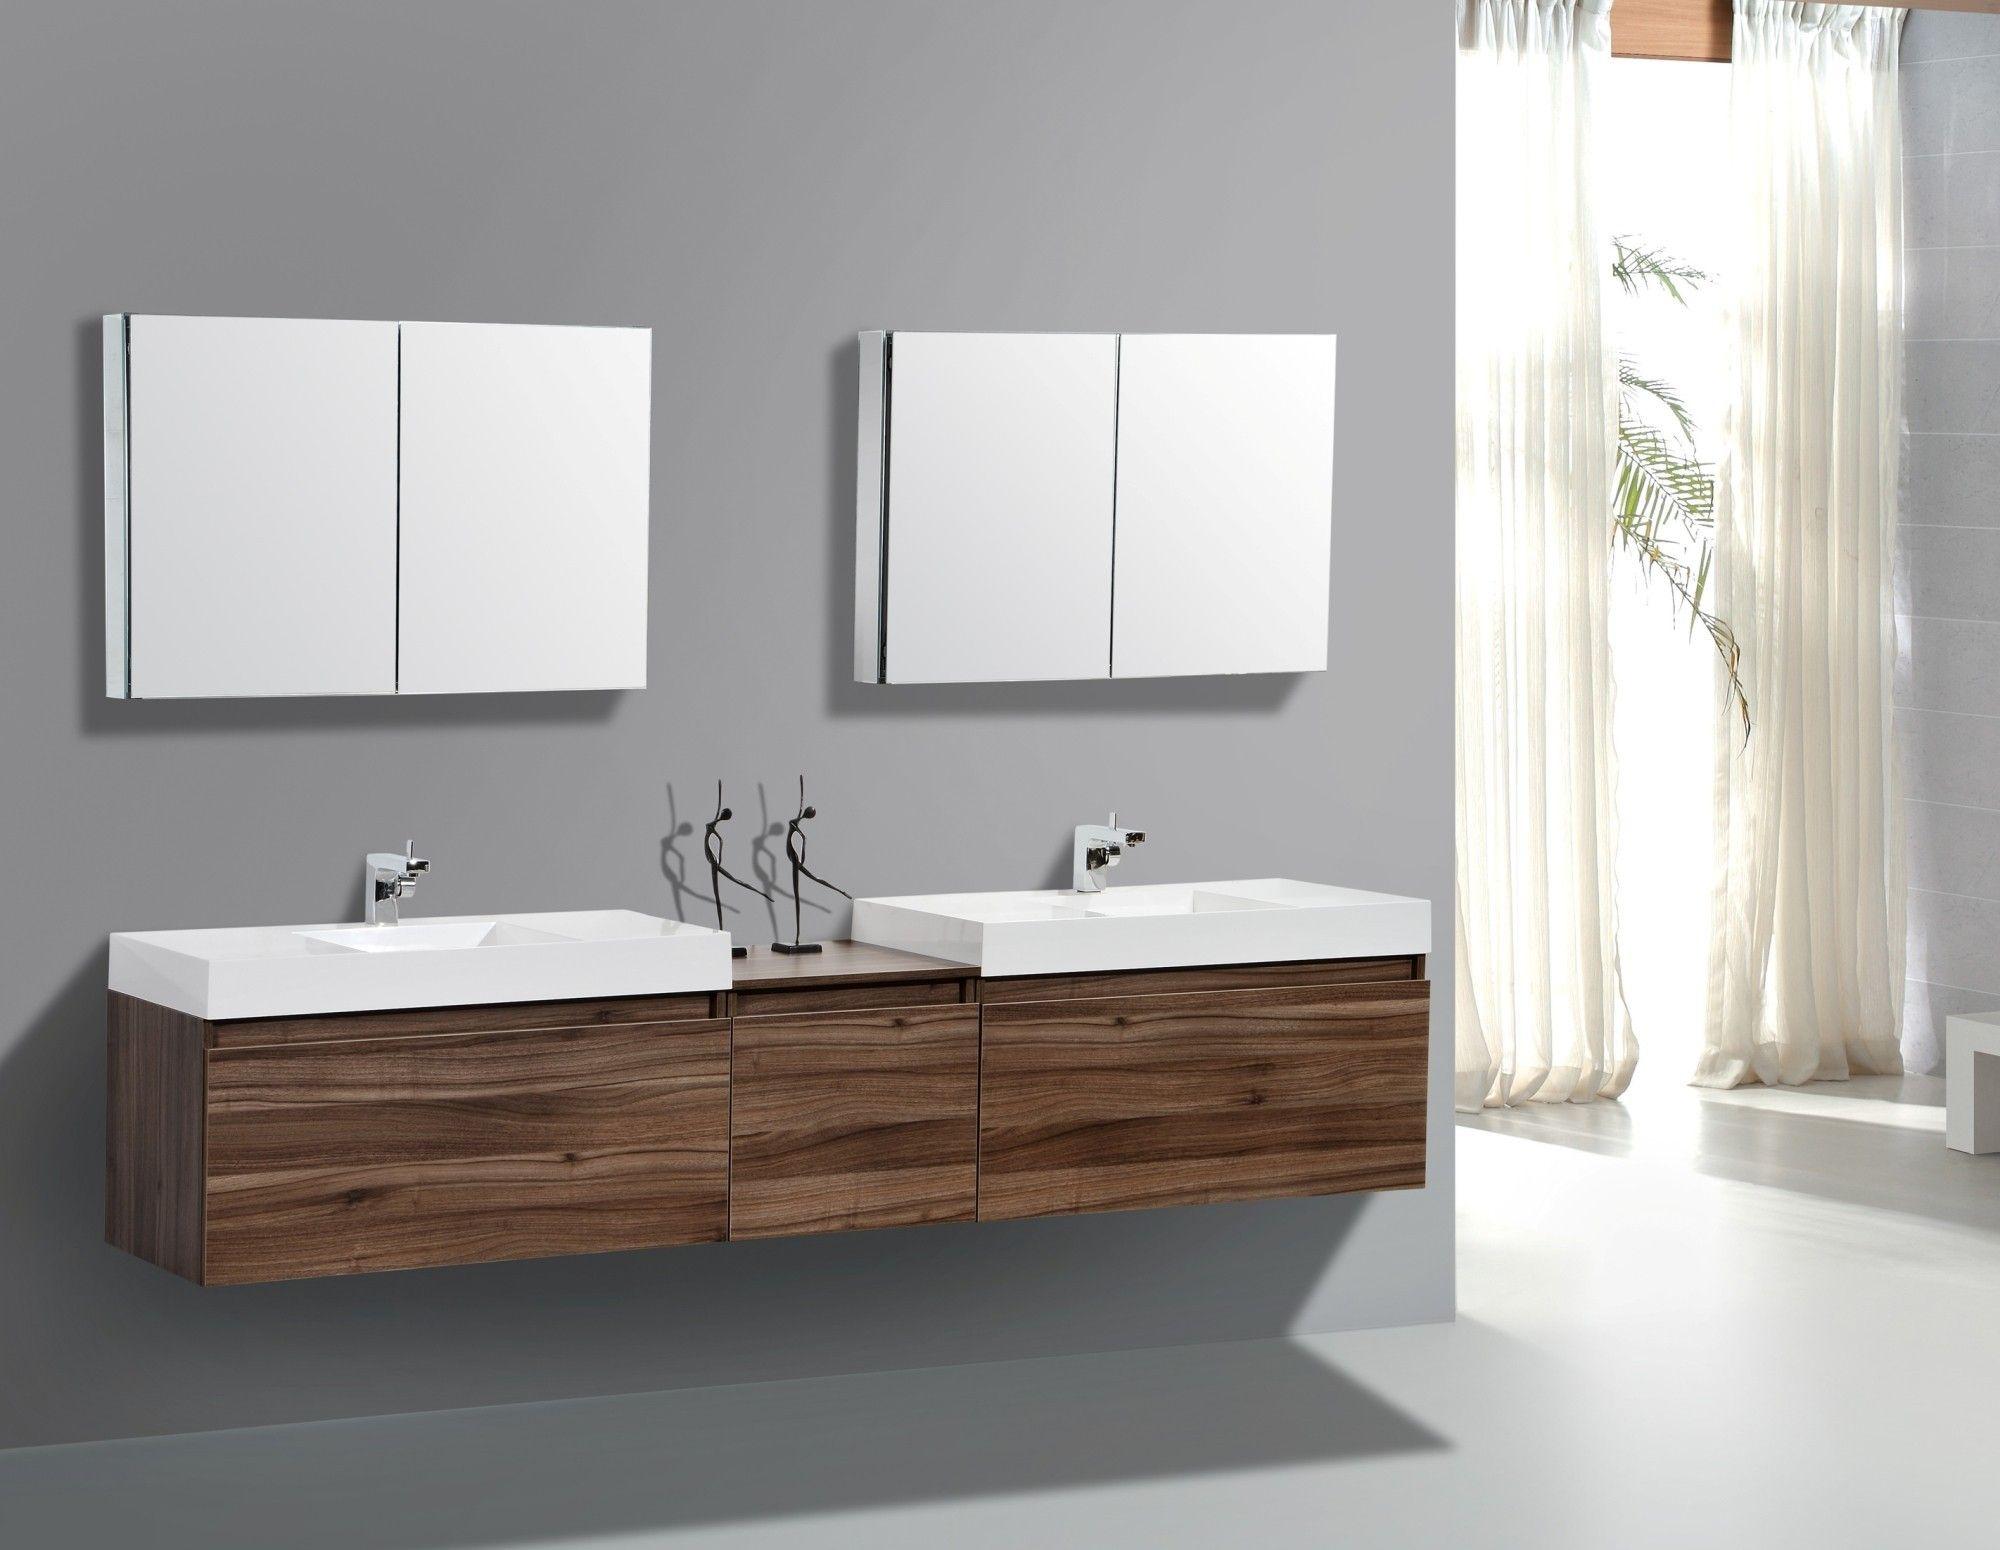 caroline usa wmsq bathroom vanities in avenue set wh vanity gd virtu double white